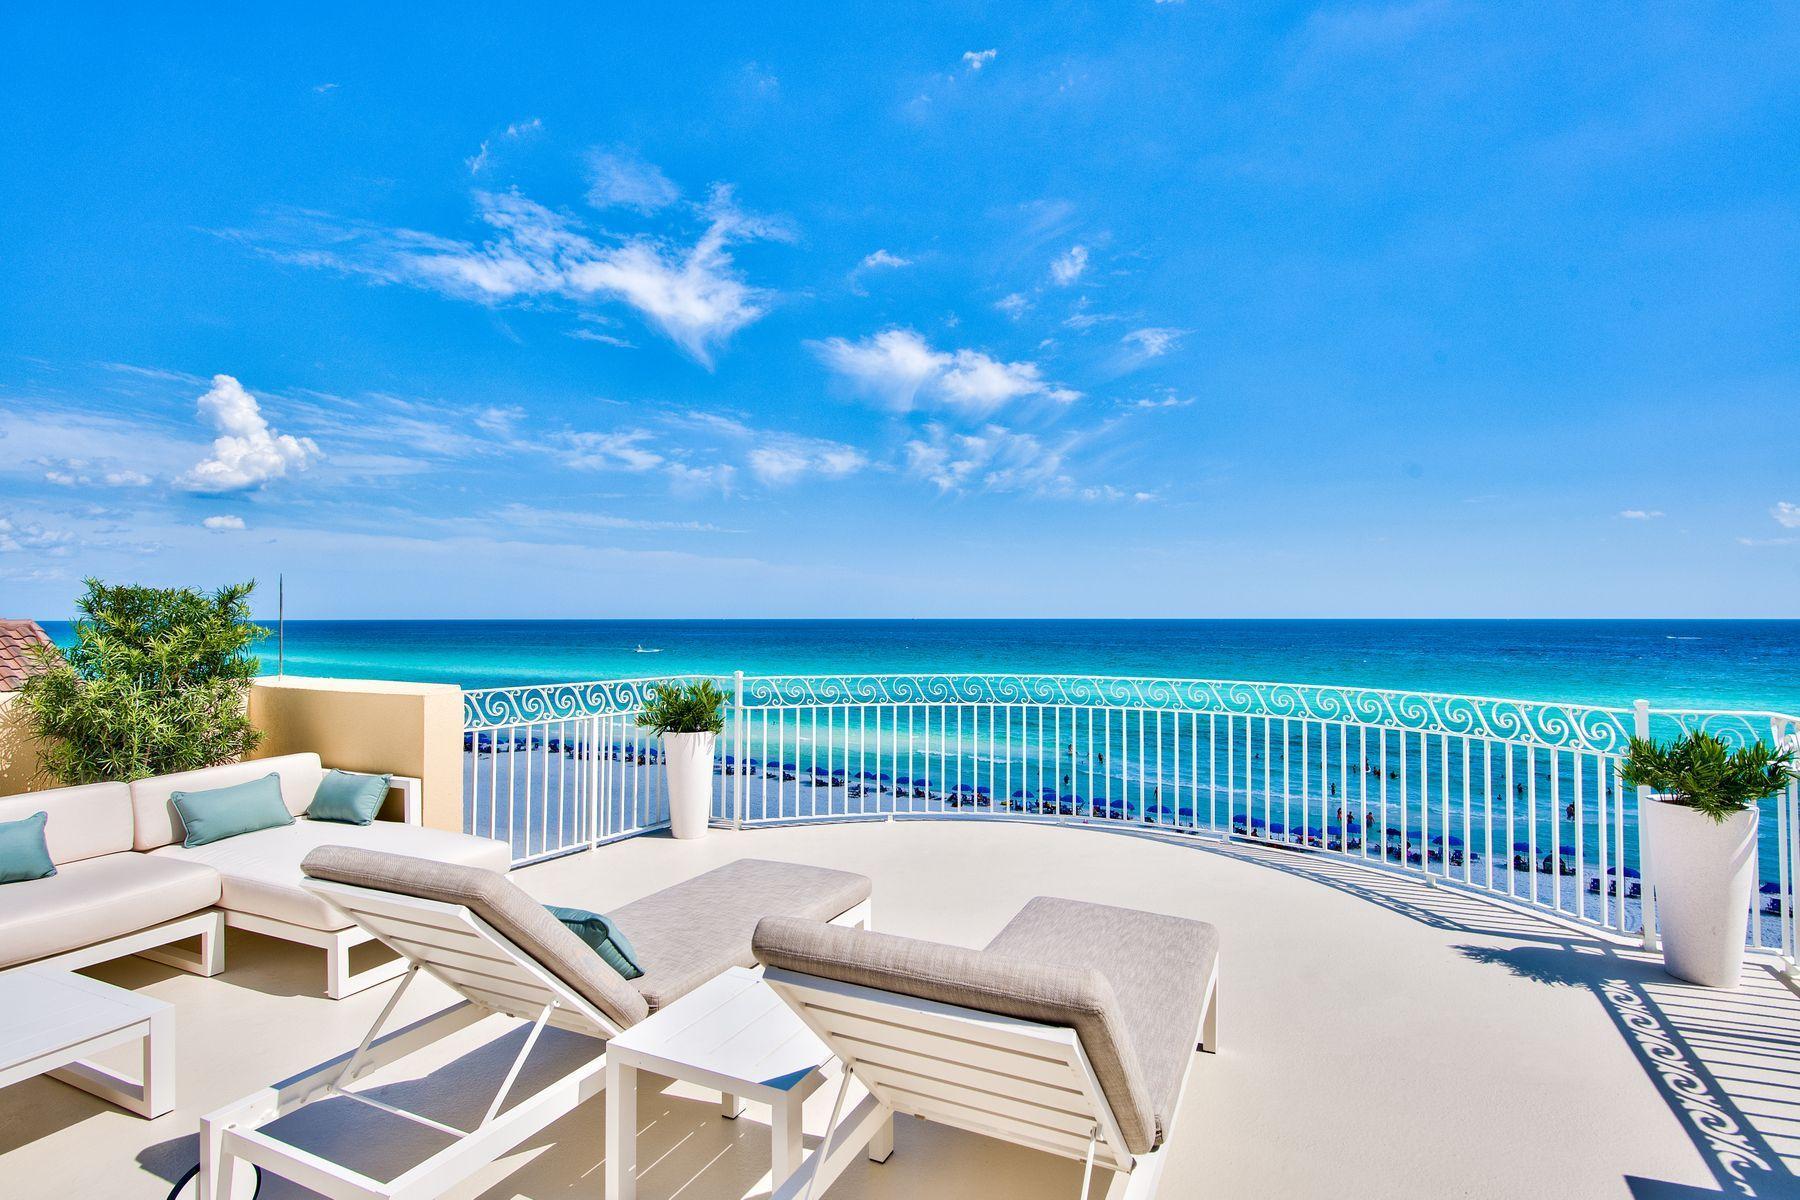 4726 Ocean Blvd, Destin, FL, 32541